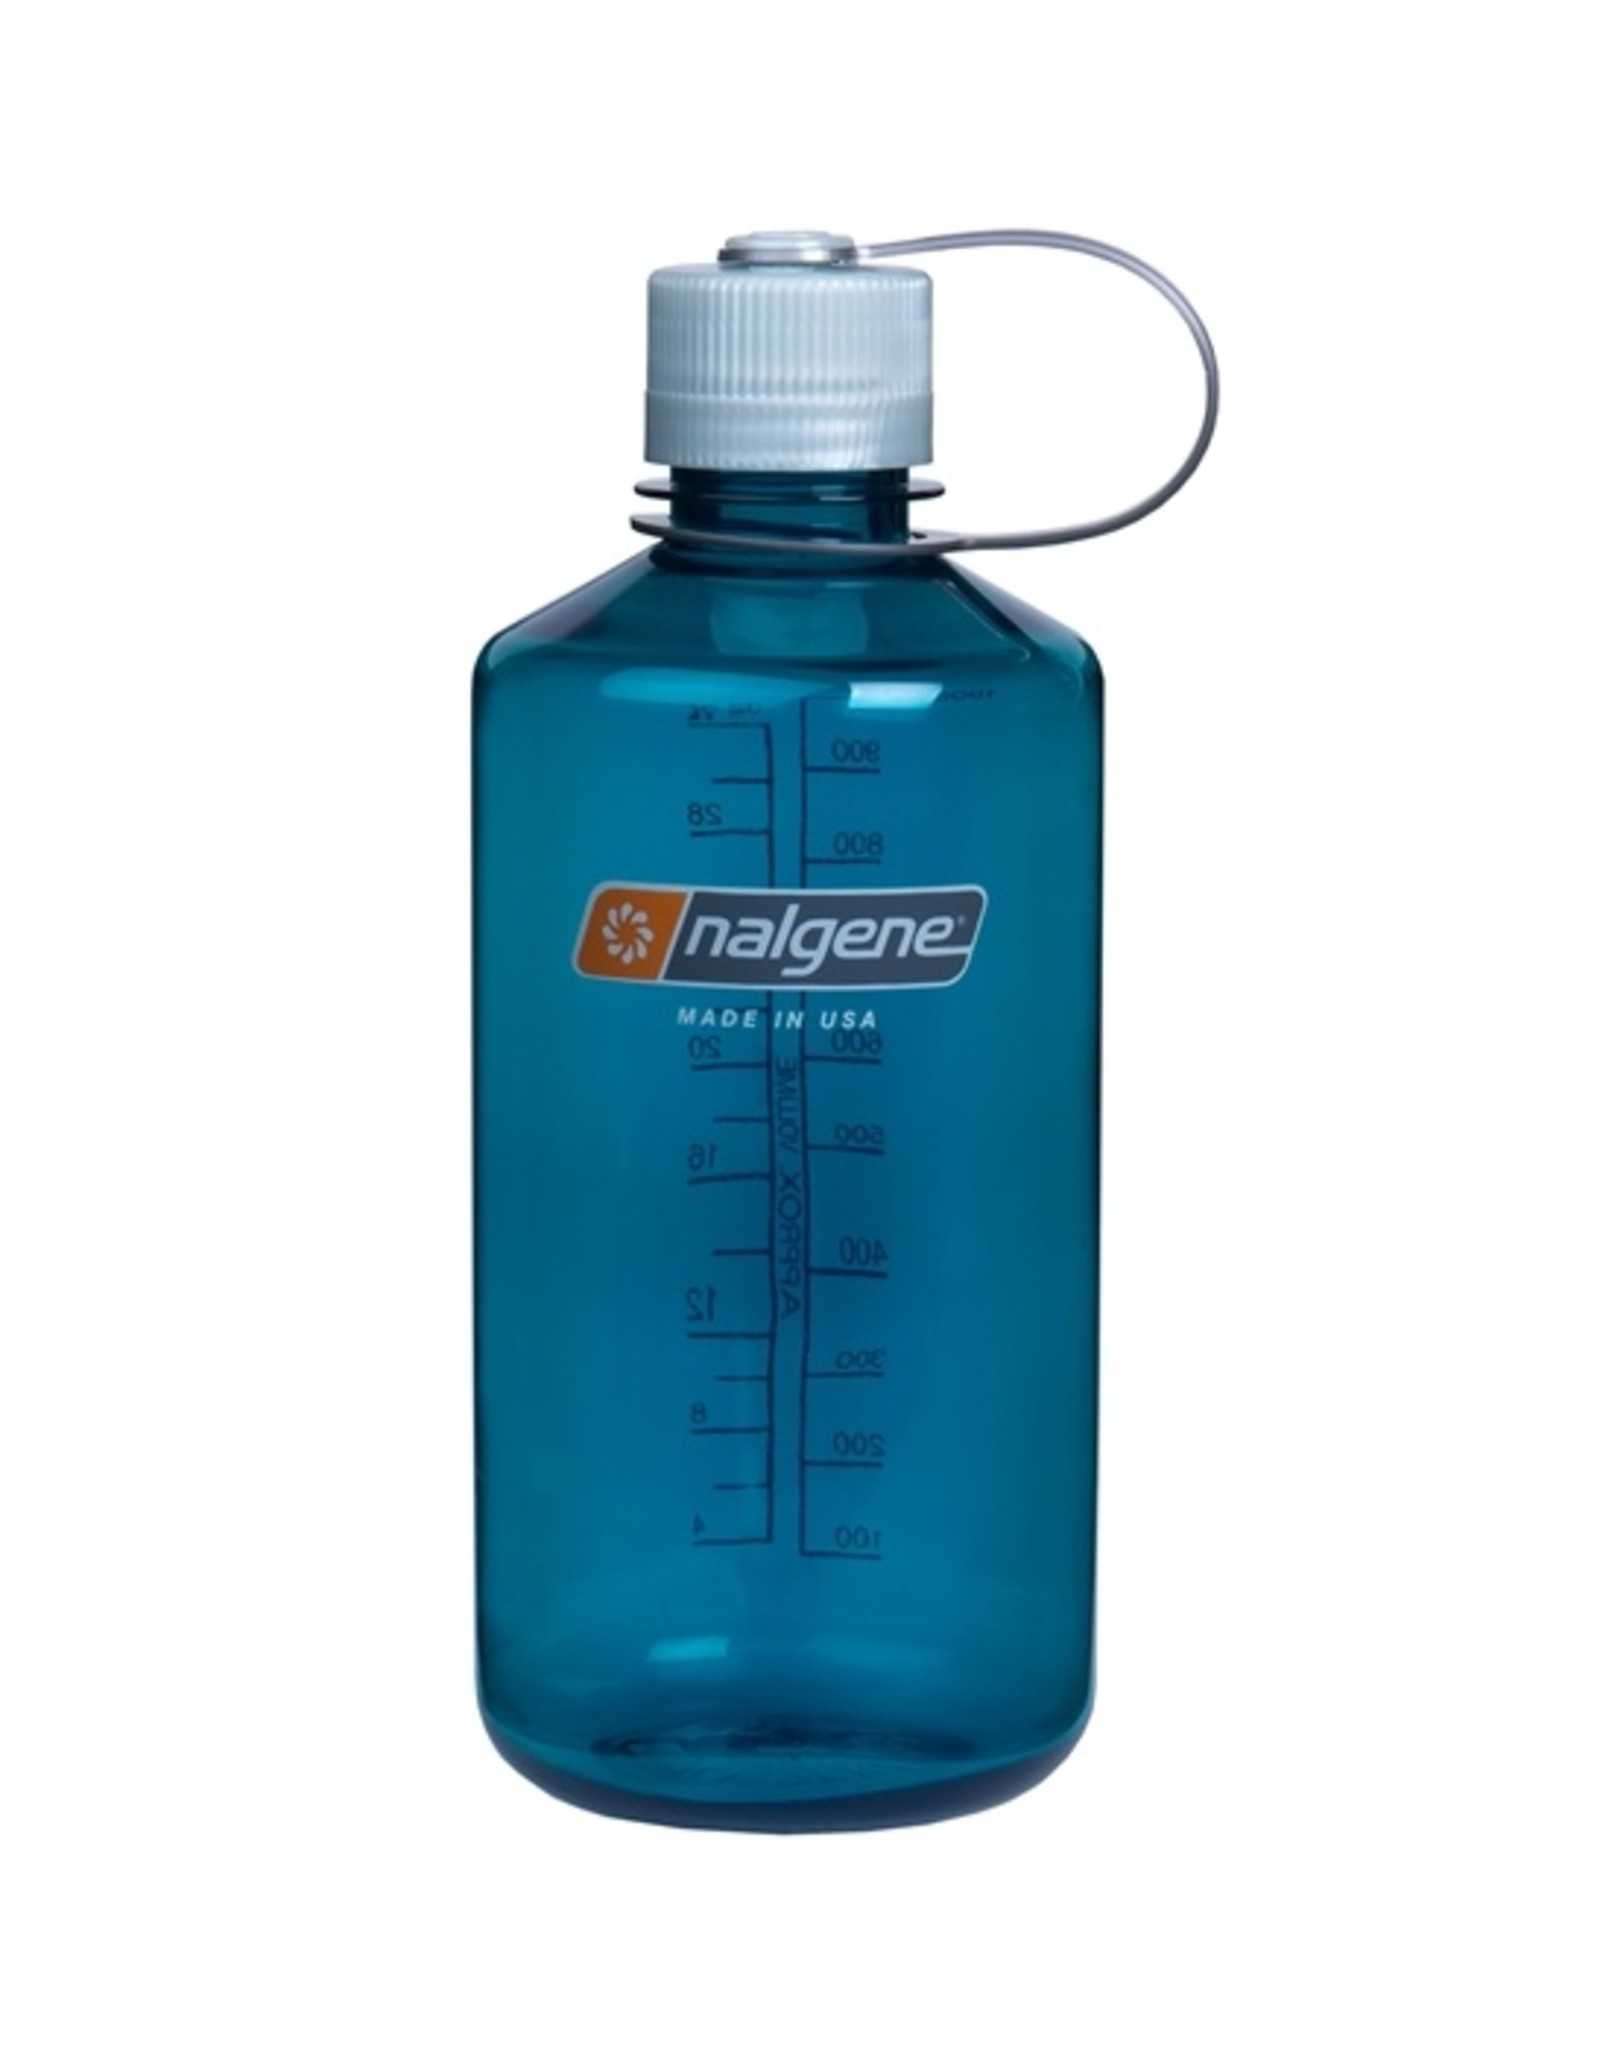 NALGENE Nalgene Small Mouth Bottle (32oz/16oz)